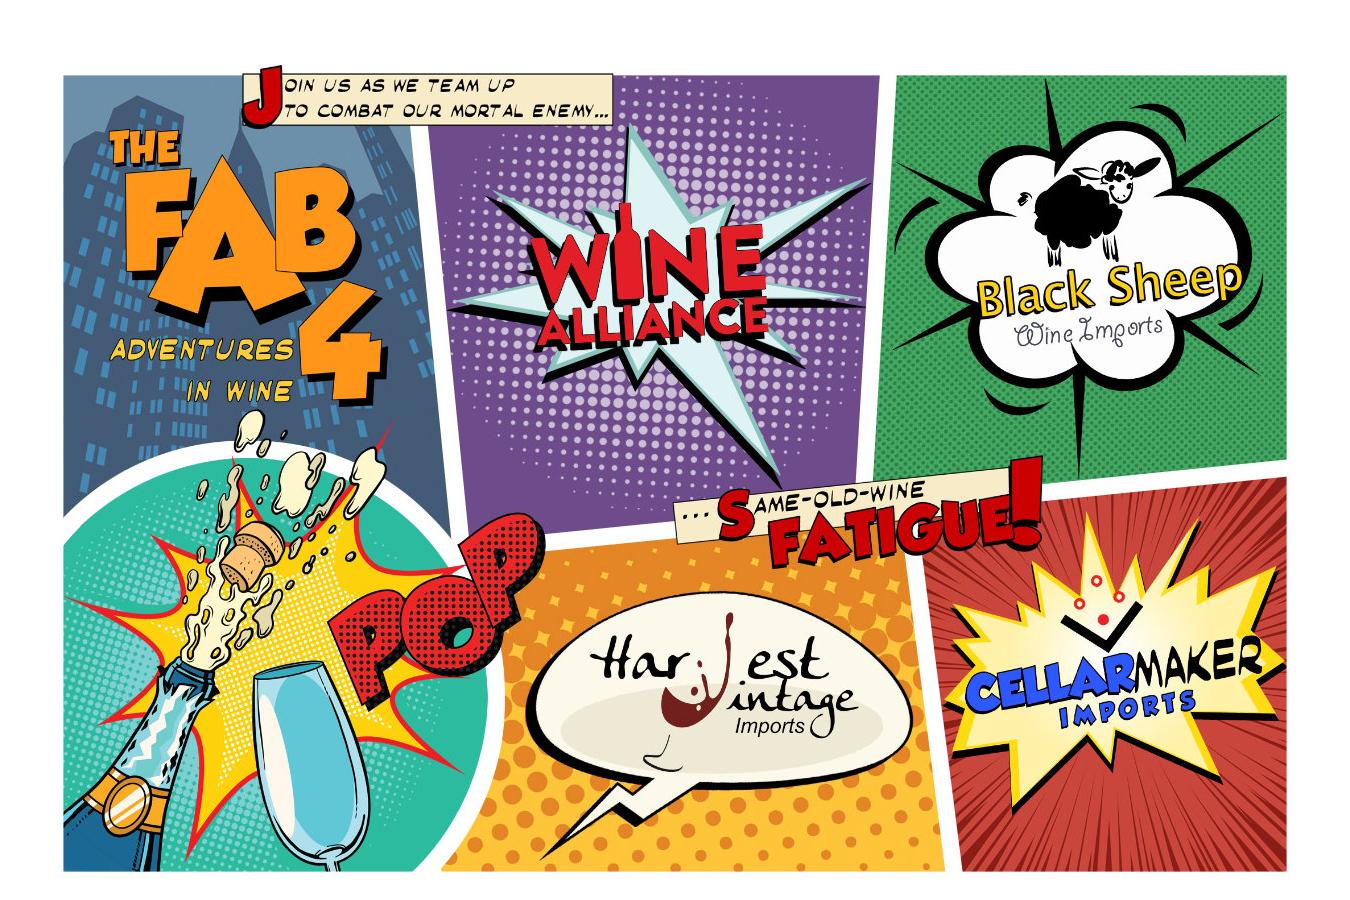 Fab4-WebPage.jpg